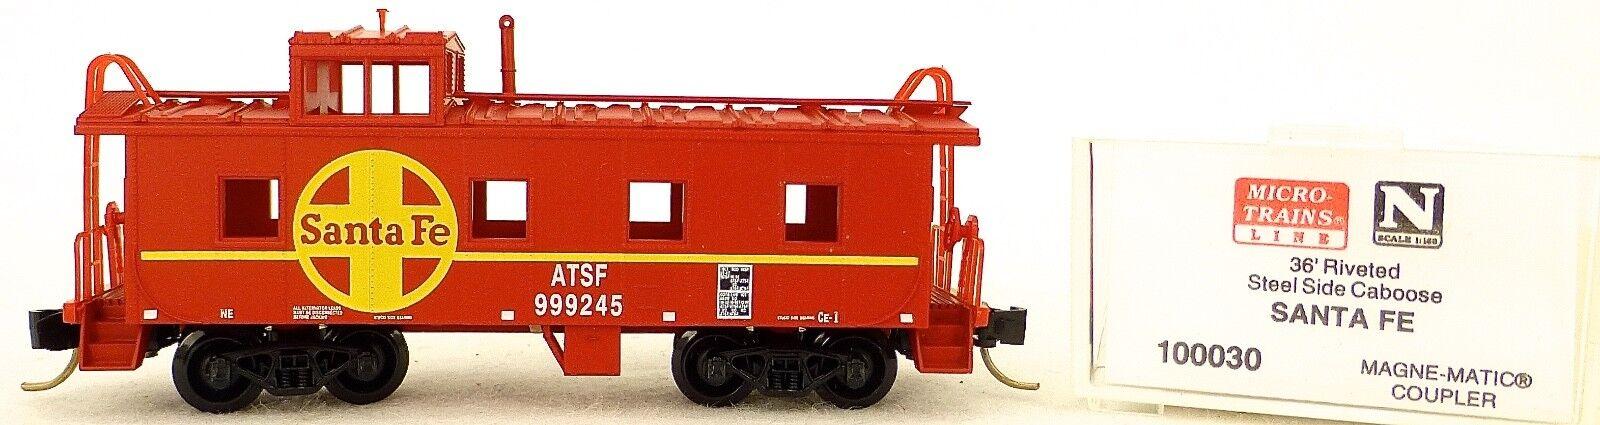 Micro Trains Line 100030 Santa Fe 999245 36' Riveted Steel Caboose 1:160  F Å